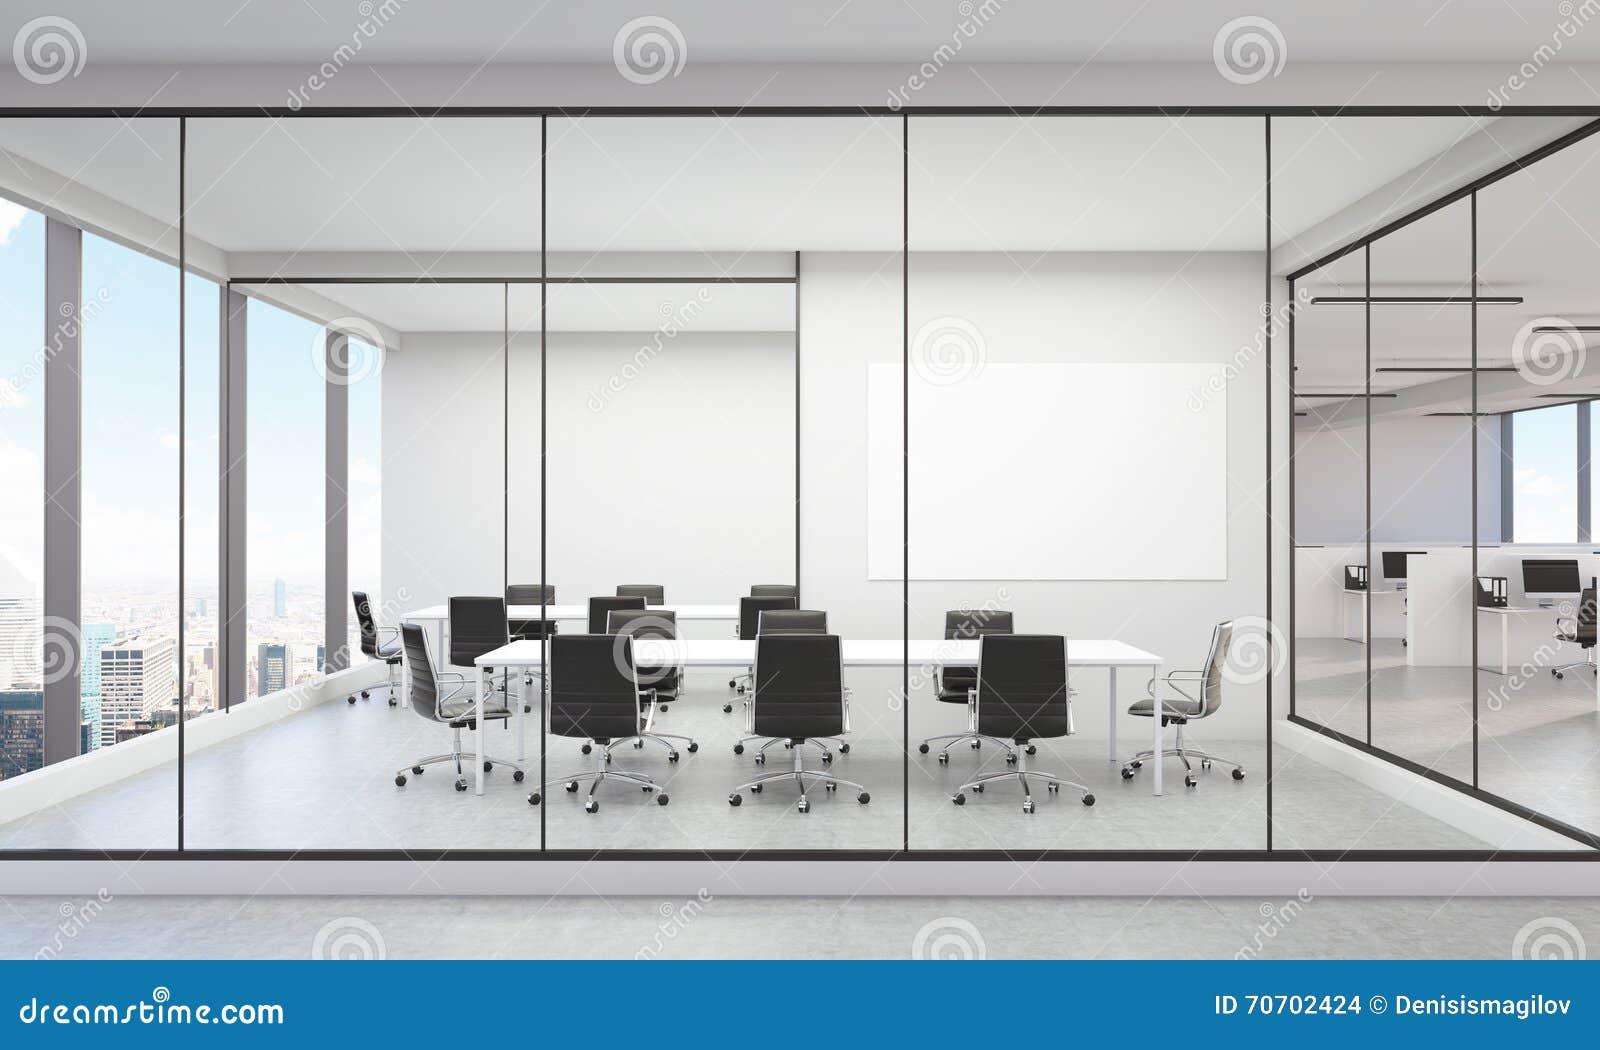 Modernes Buro Innen Ny Stock Abbildung Illustration Von Stadt